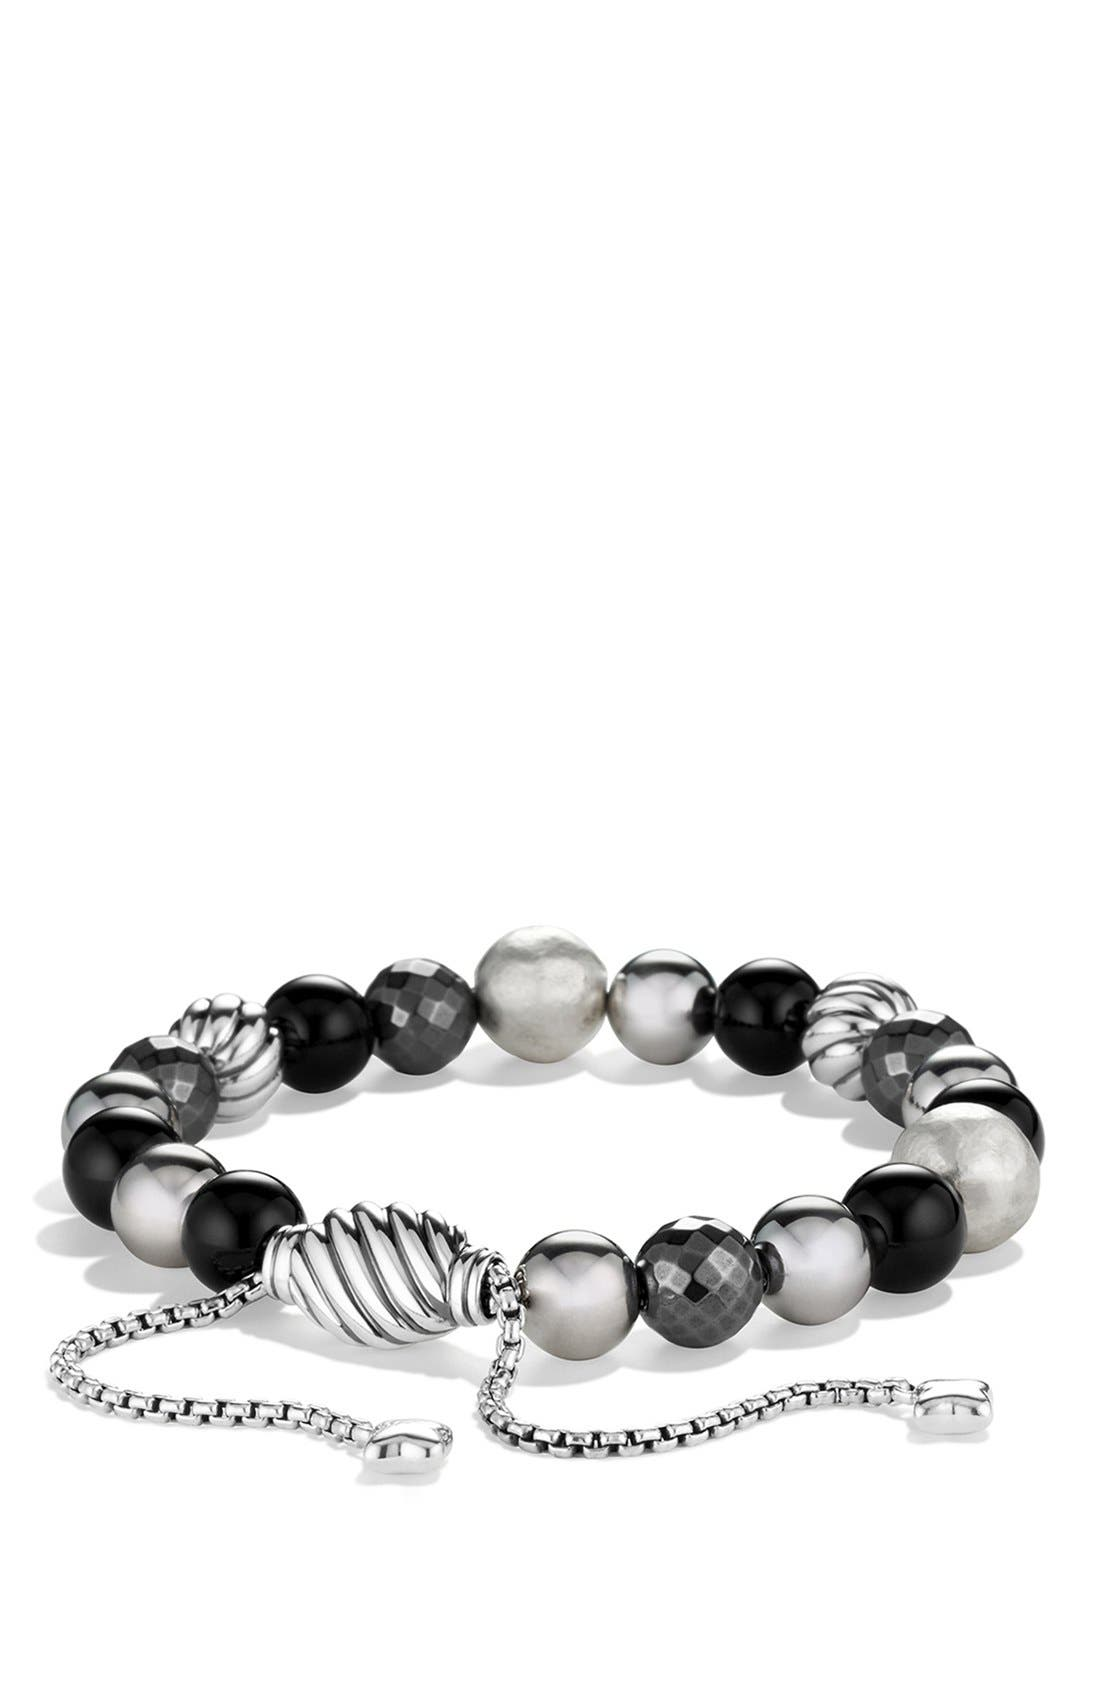 'DY Elements' Bead Bracelet,                             Main thumbnail 1, color,                             BLACK ONYX